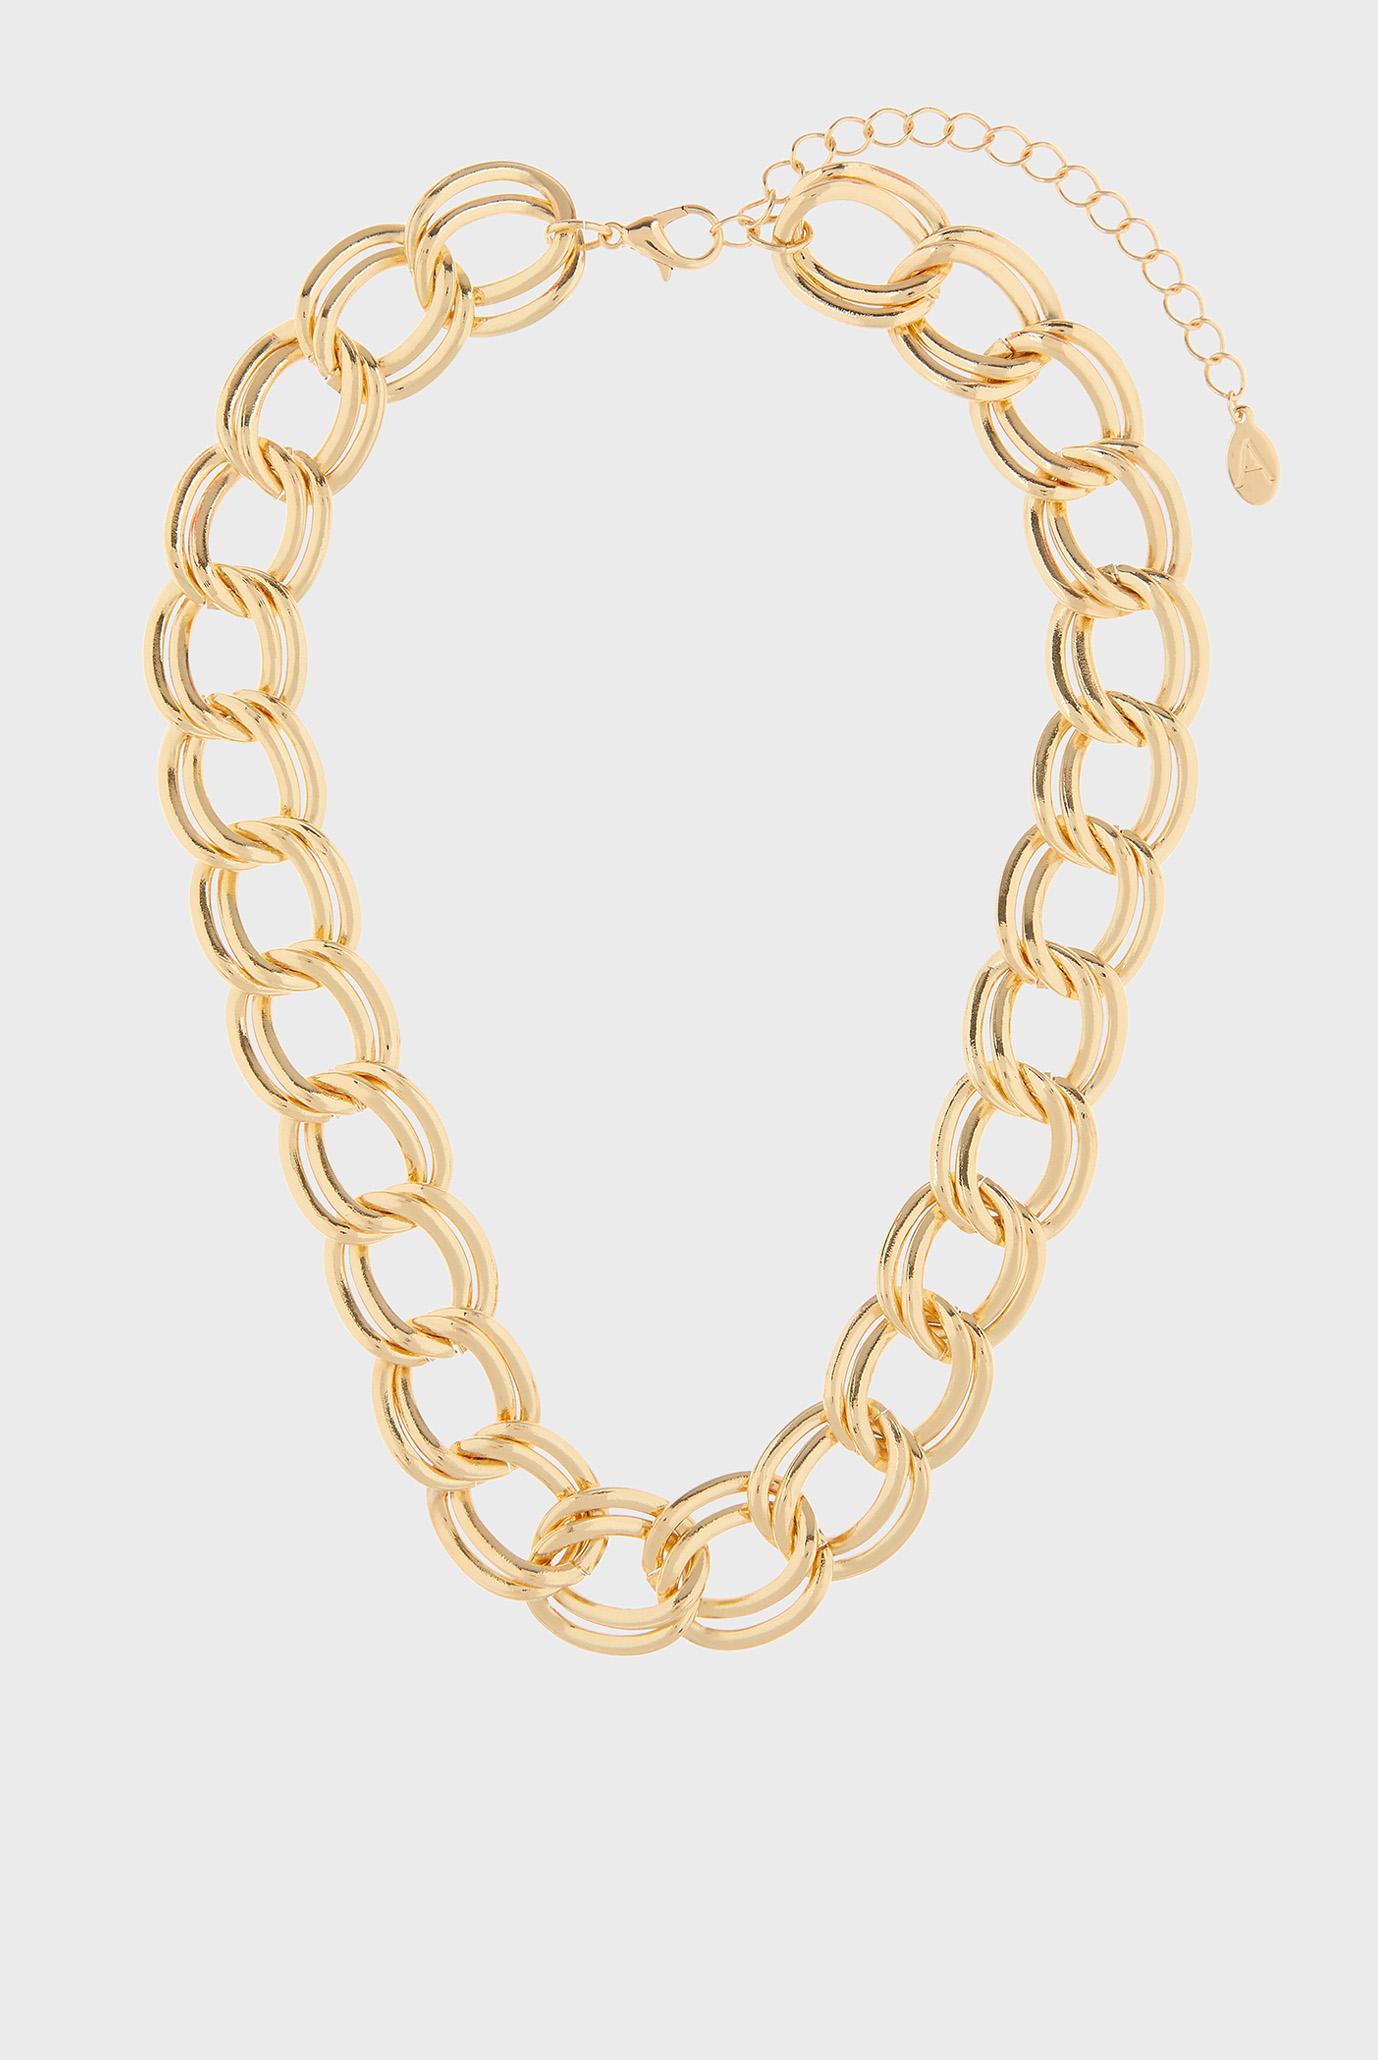 Жіноче золотисте кольє DOUBLE LINKED CURB 1